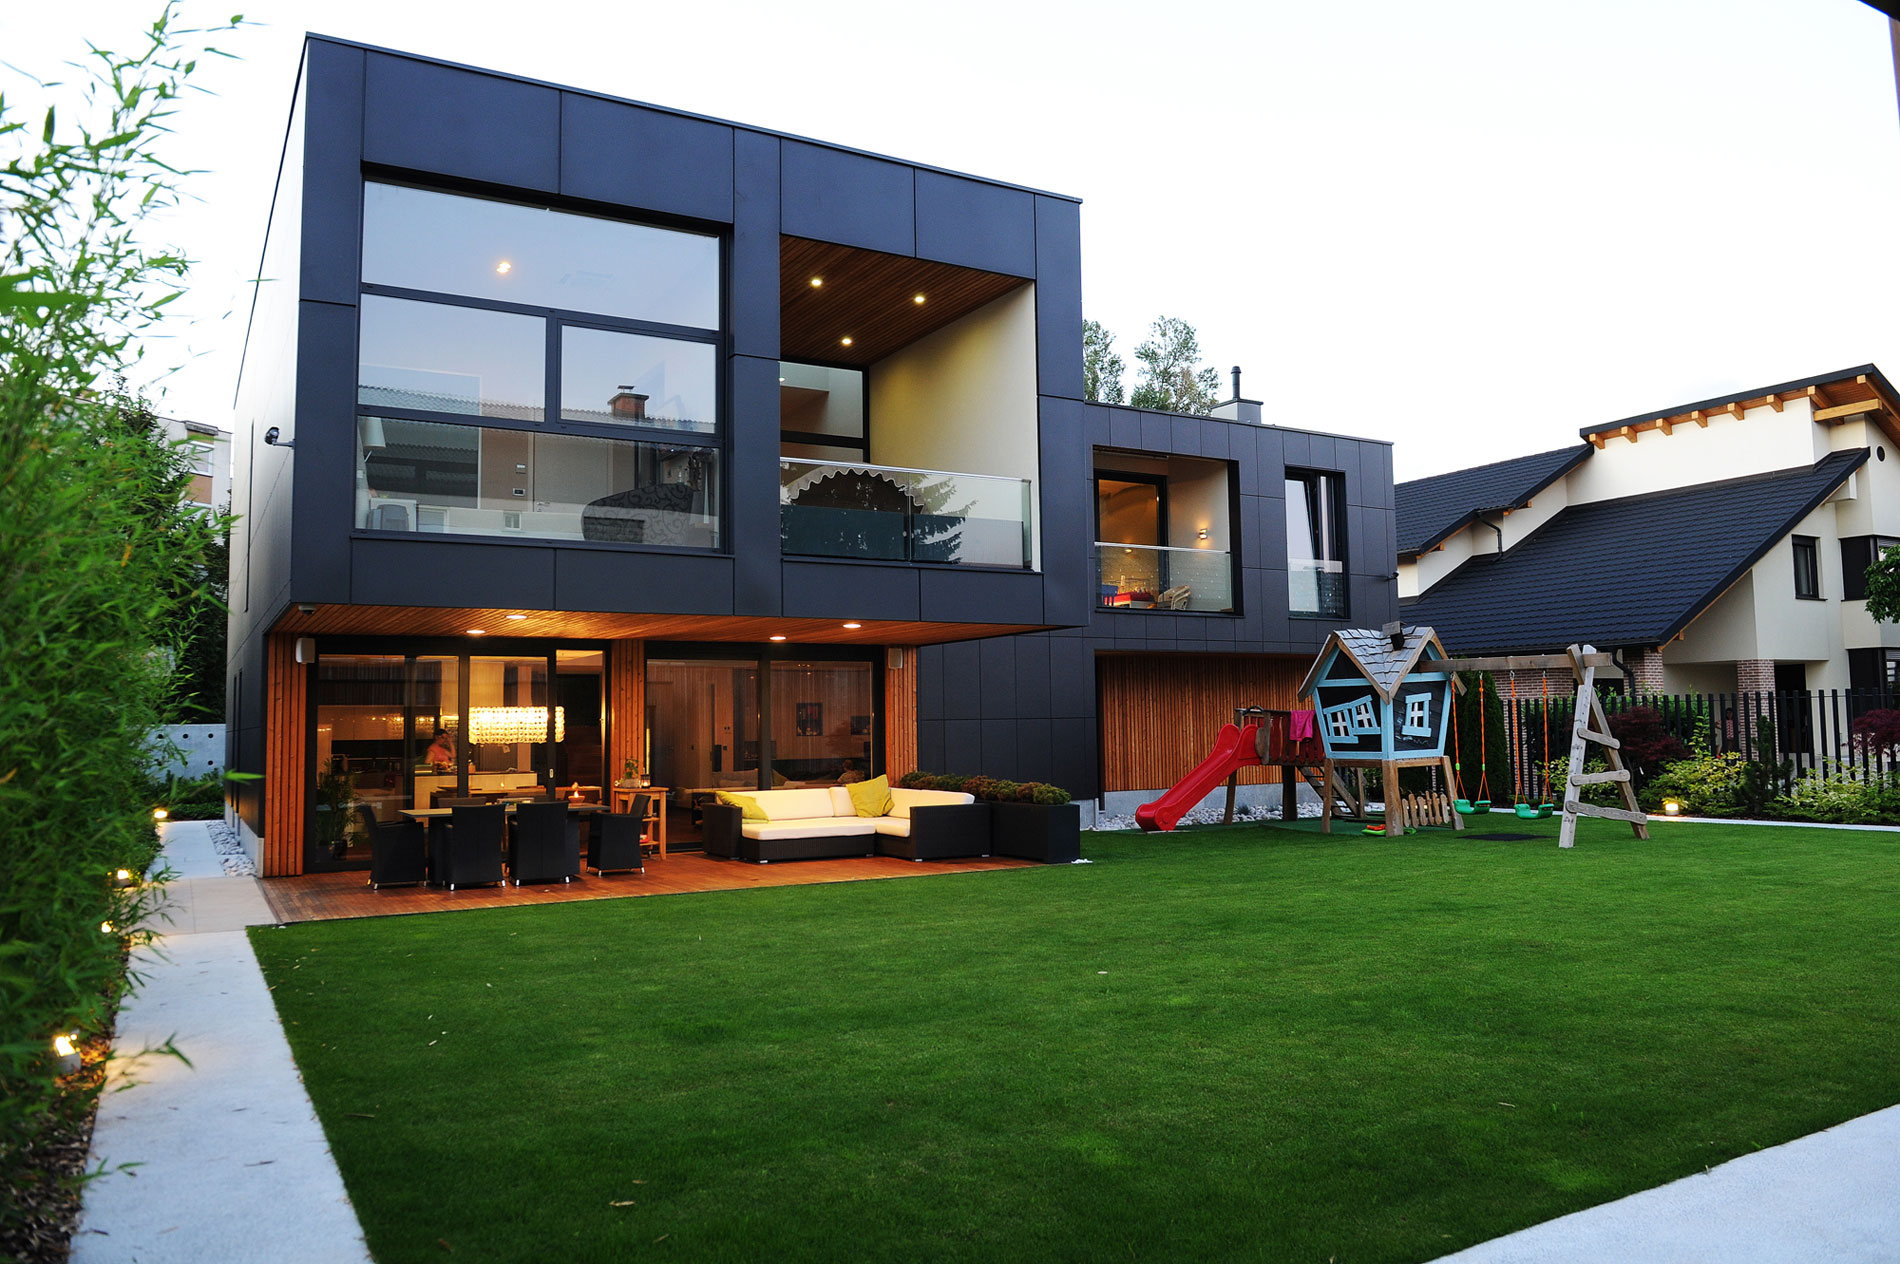 The Black Villa by Primož Novak & Demšar arhitekti d.o.o.